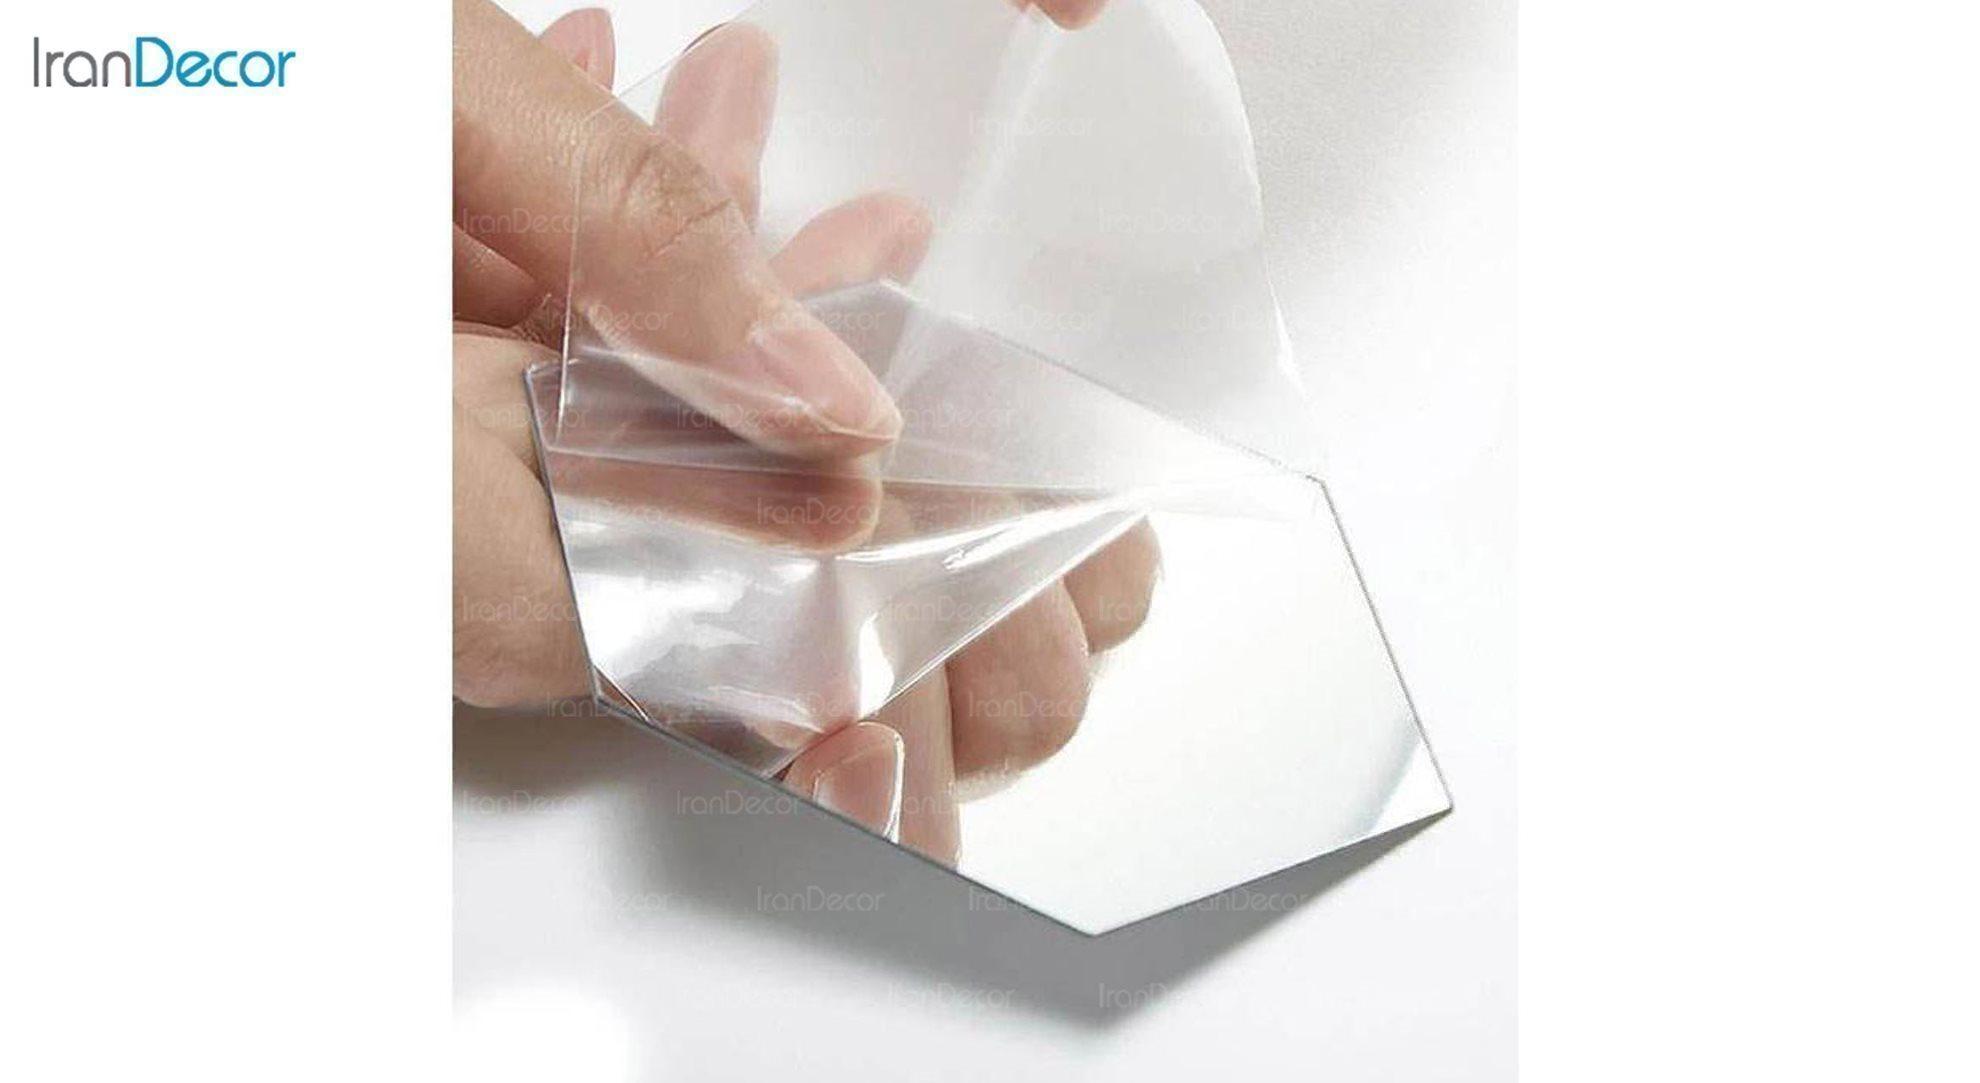 آینه پلکسی گلس طرح قلب رومادون کد 452 اندازه 40 سانتی متر نایلون ضد خش